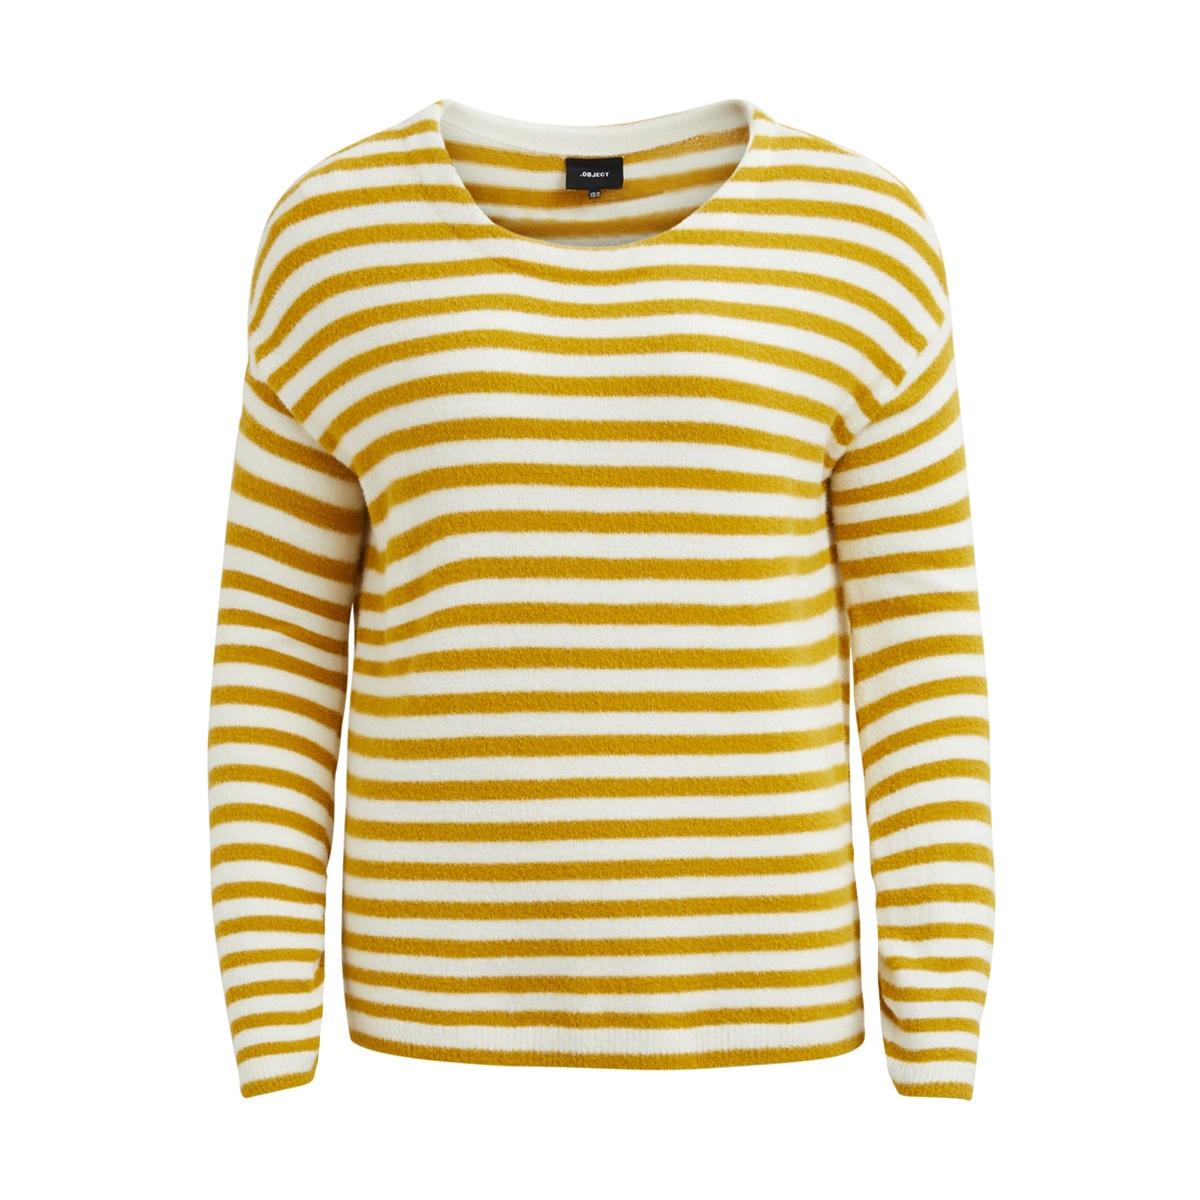 objlauren l/s pullover a wi 23026605 object trui gardenia/harvest